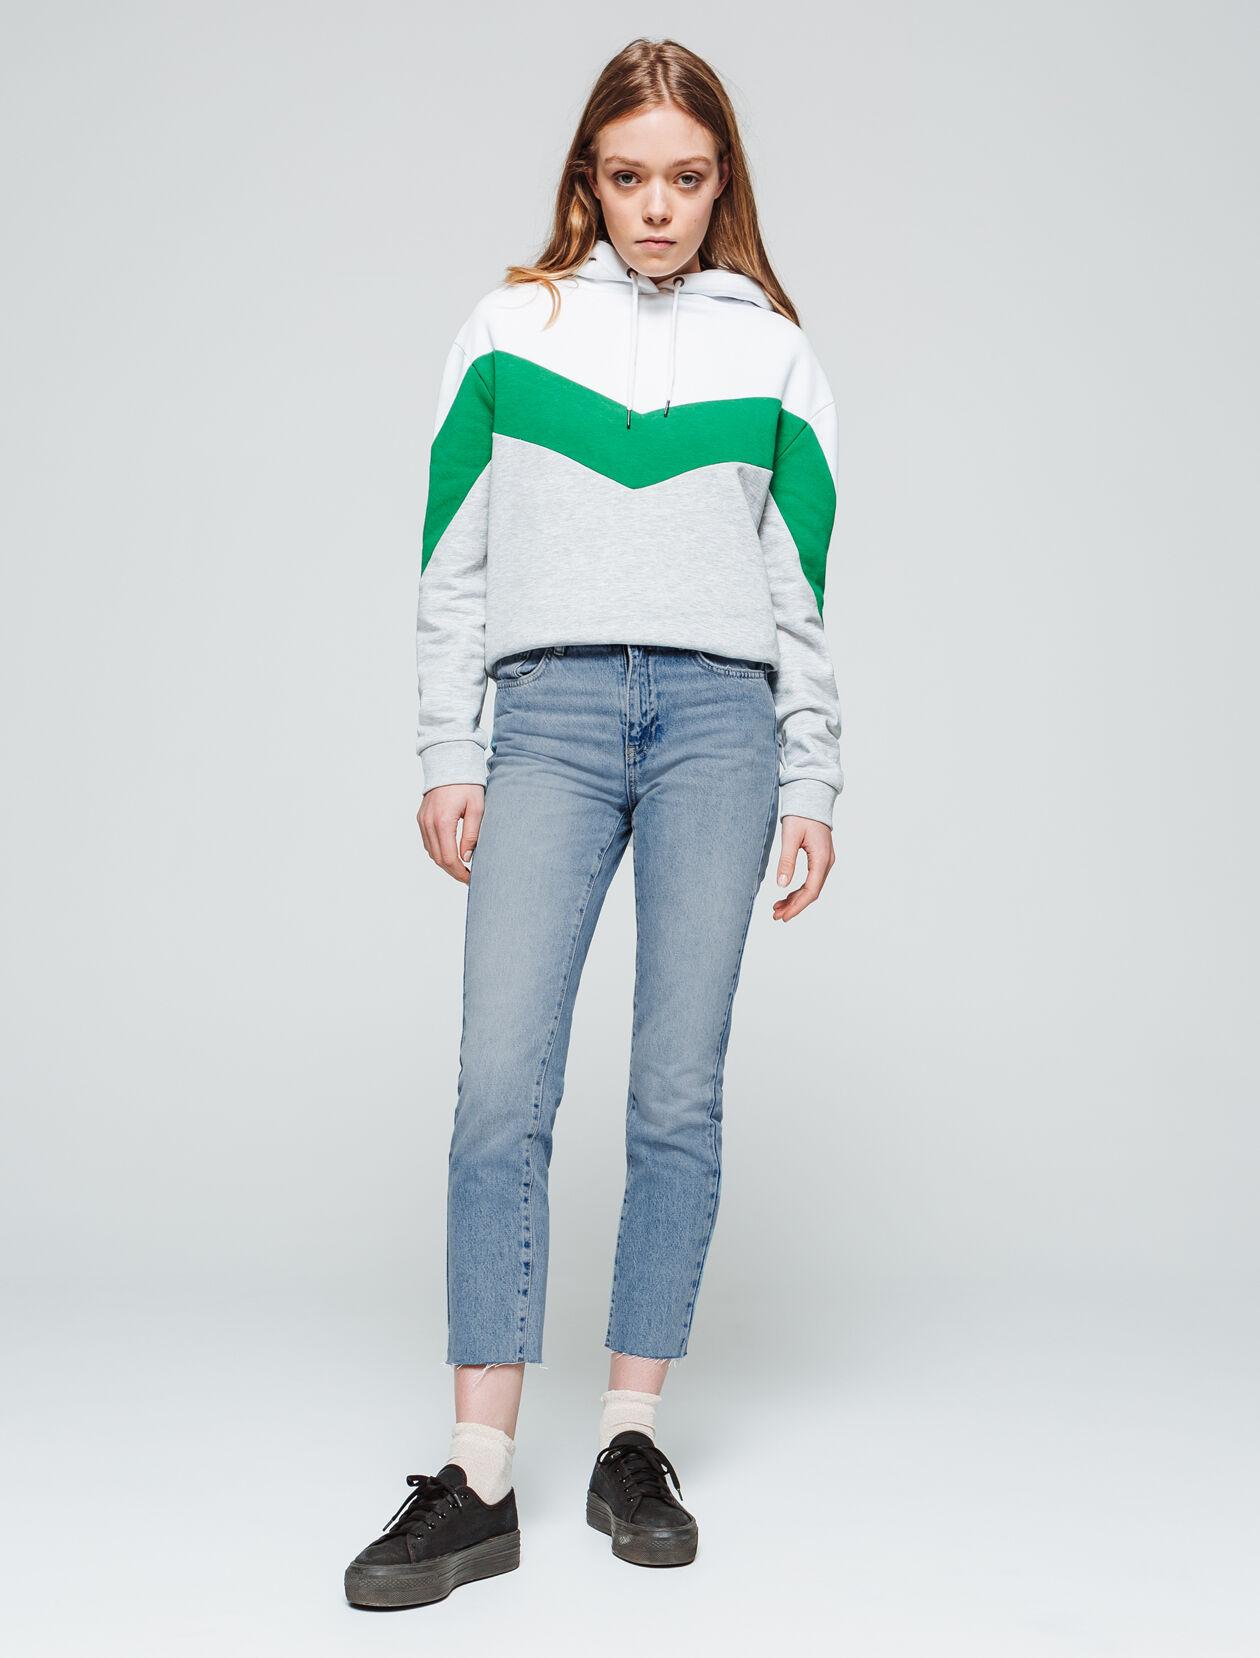 Skinny Jeans Slim Skinny Femme Bizzbee Femme Jeans Femme Bizzbee Slim Jeans qFZzw1